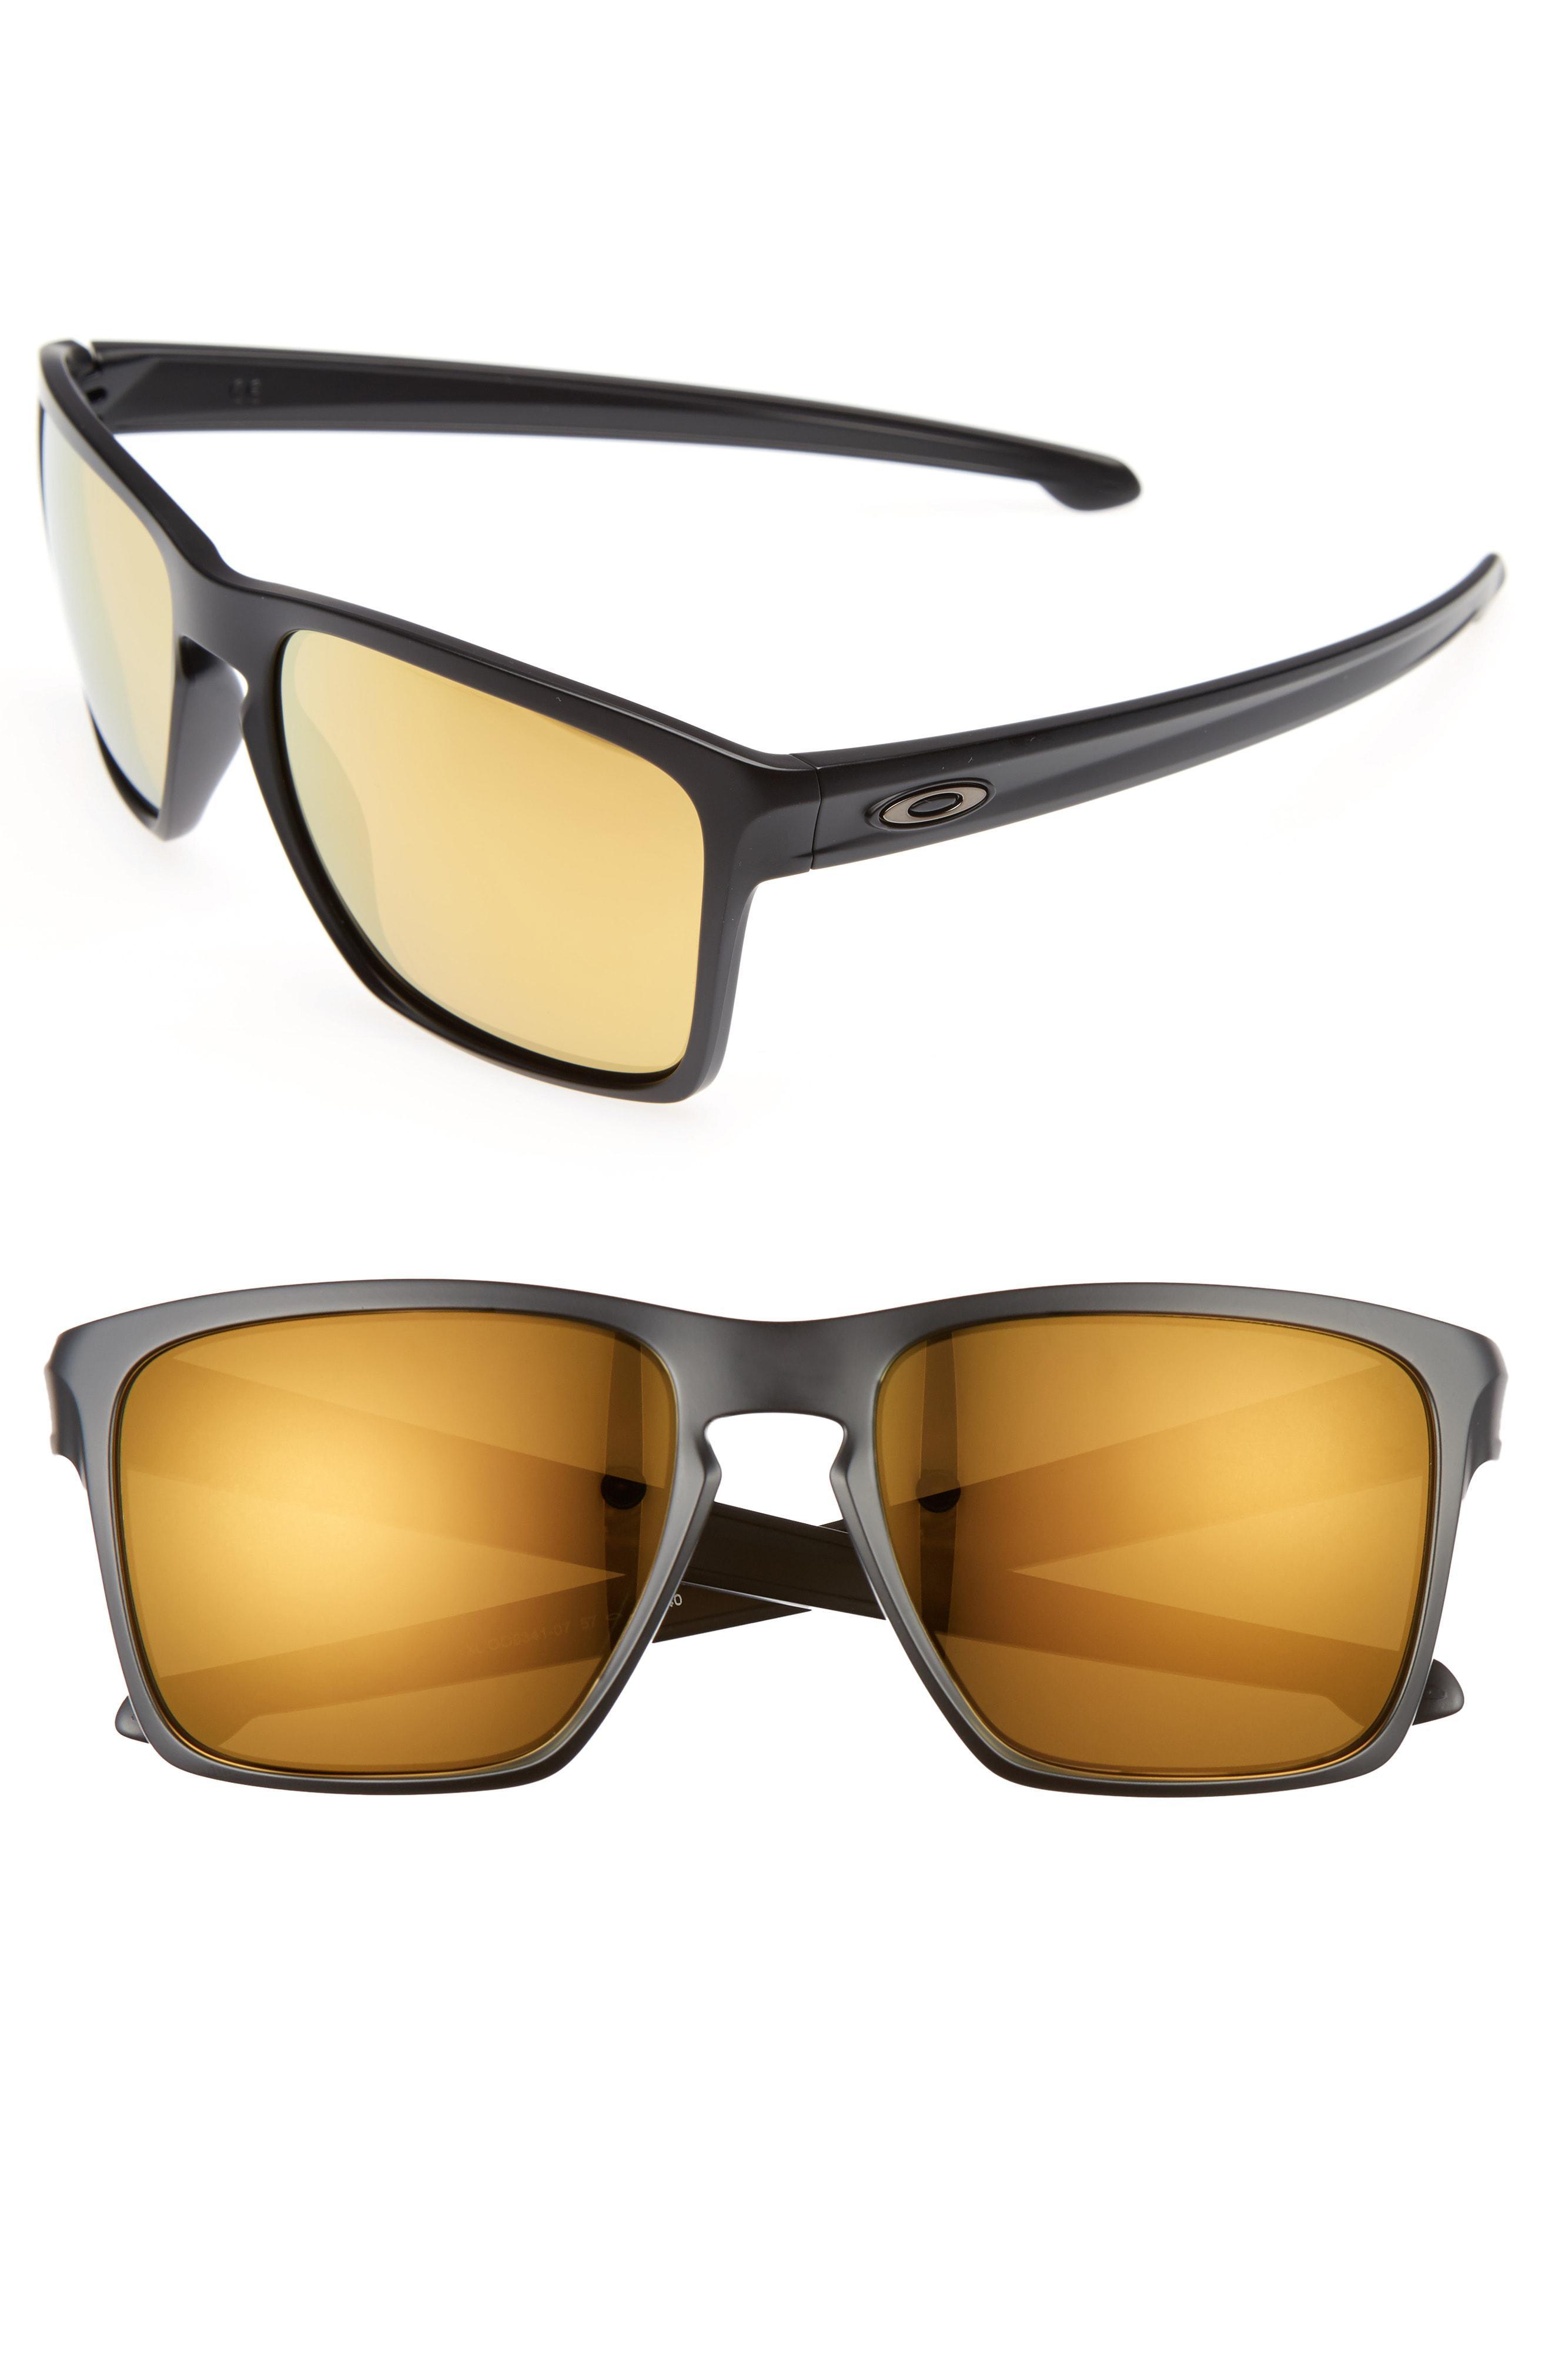 f20c145450e1 Oakley - Metallic Silver Xl 57mm Sunglasses - for Men - Lyst. View  fullscreen